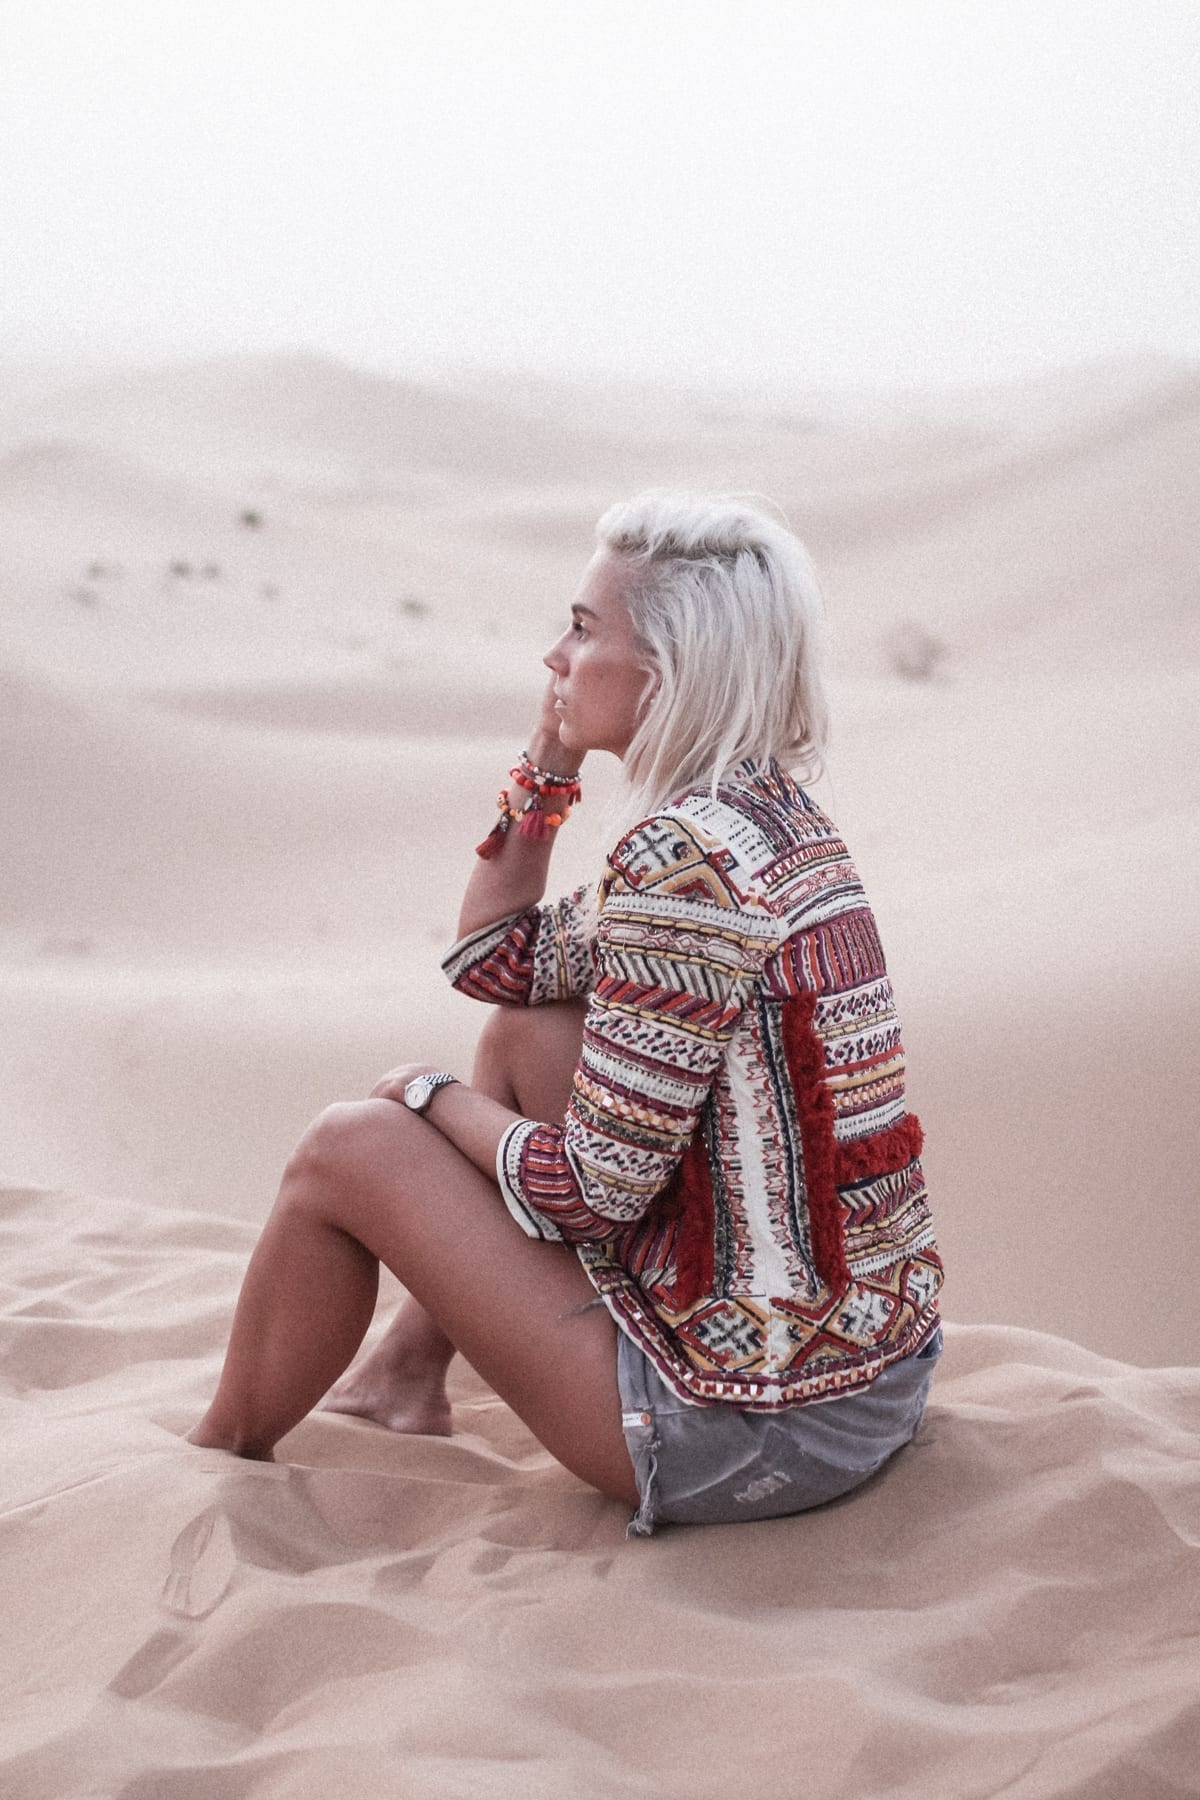 CK_1604_Constantly-K-Abu-Dhabi-desert-faschion-Shooting-5431